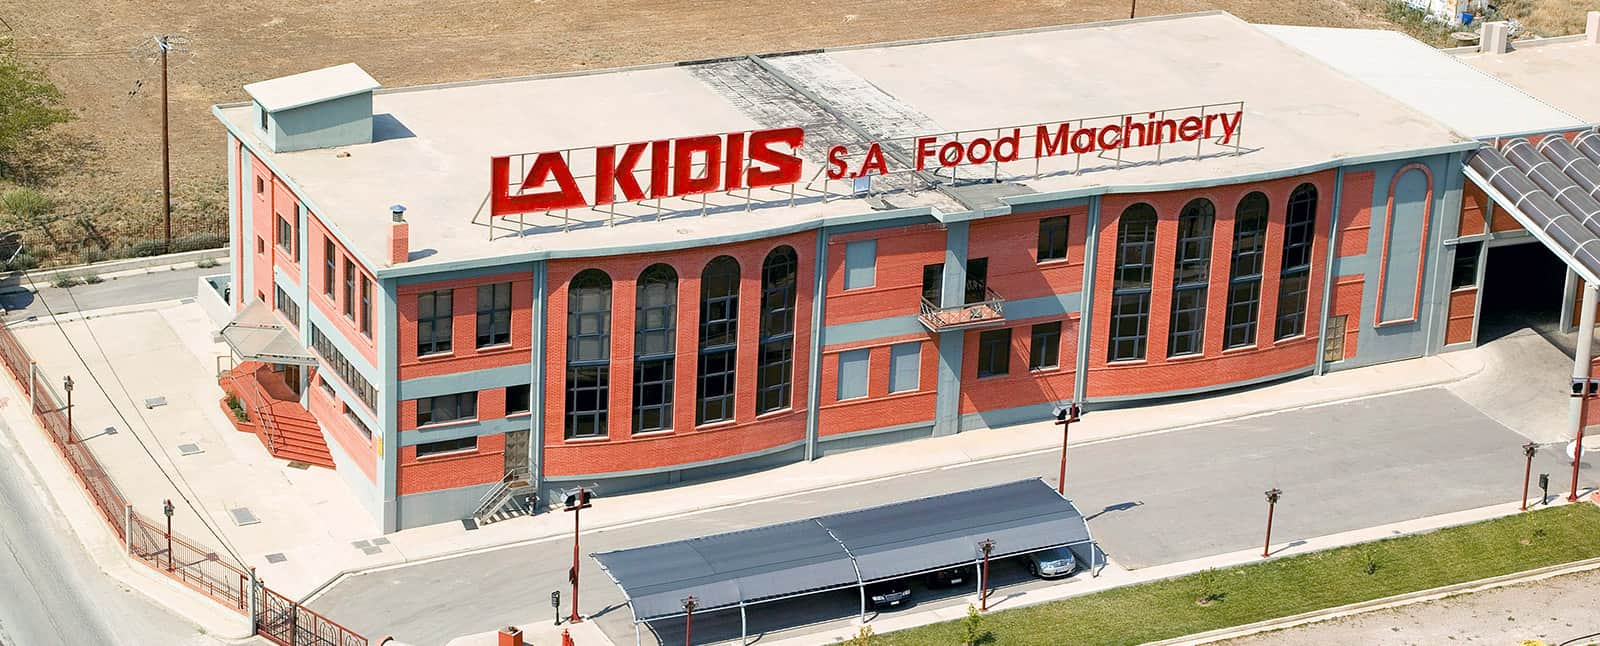 Lakidis Machinery